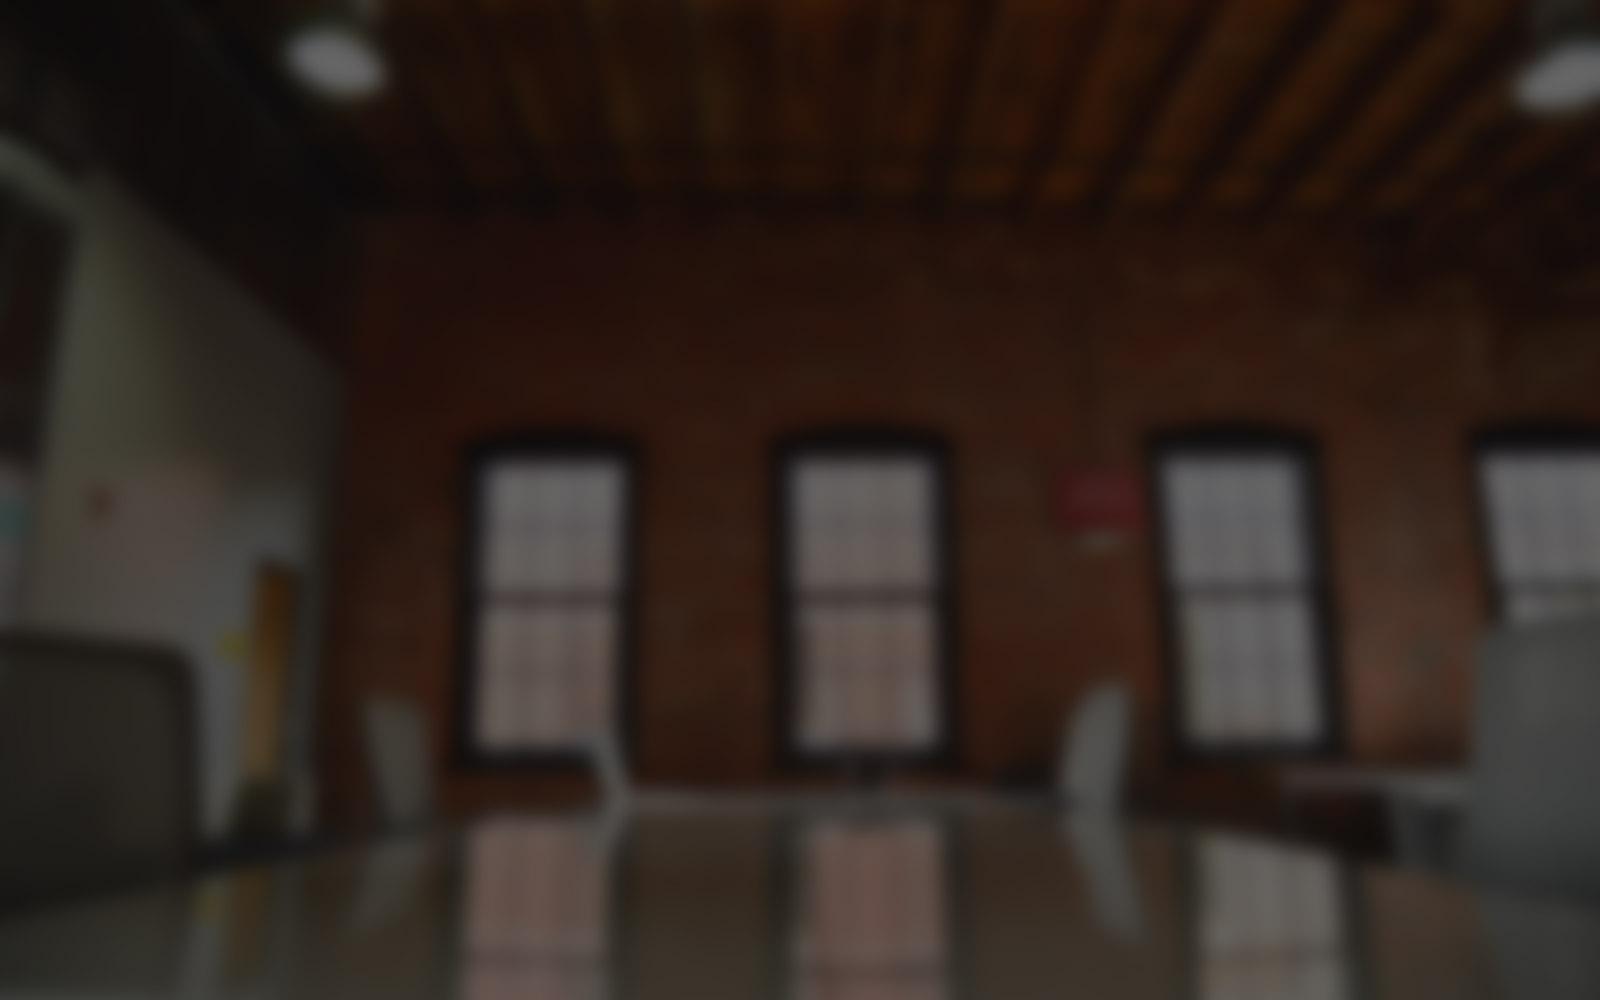 bg-classroom-blurred